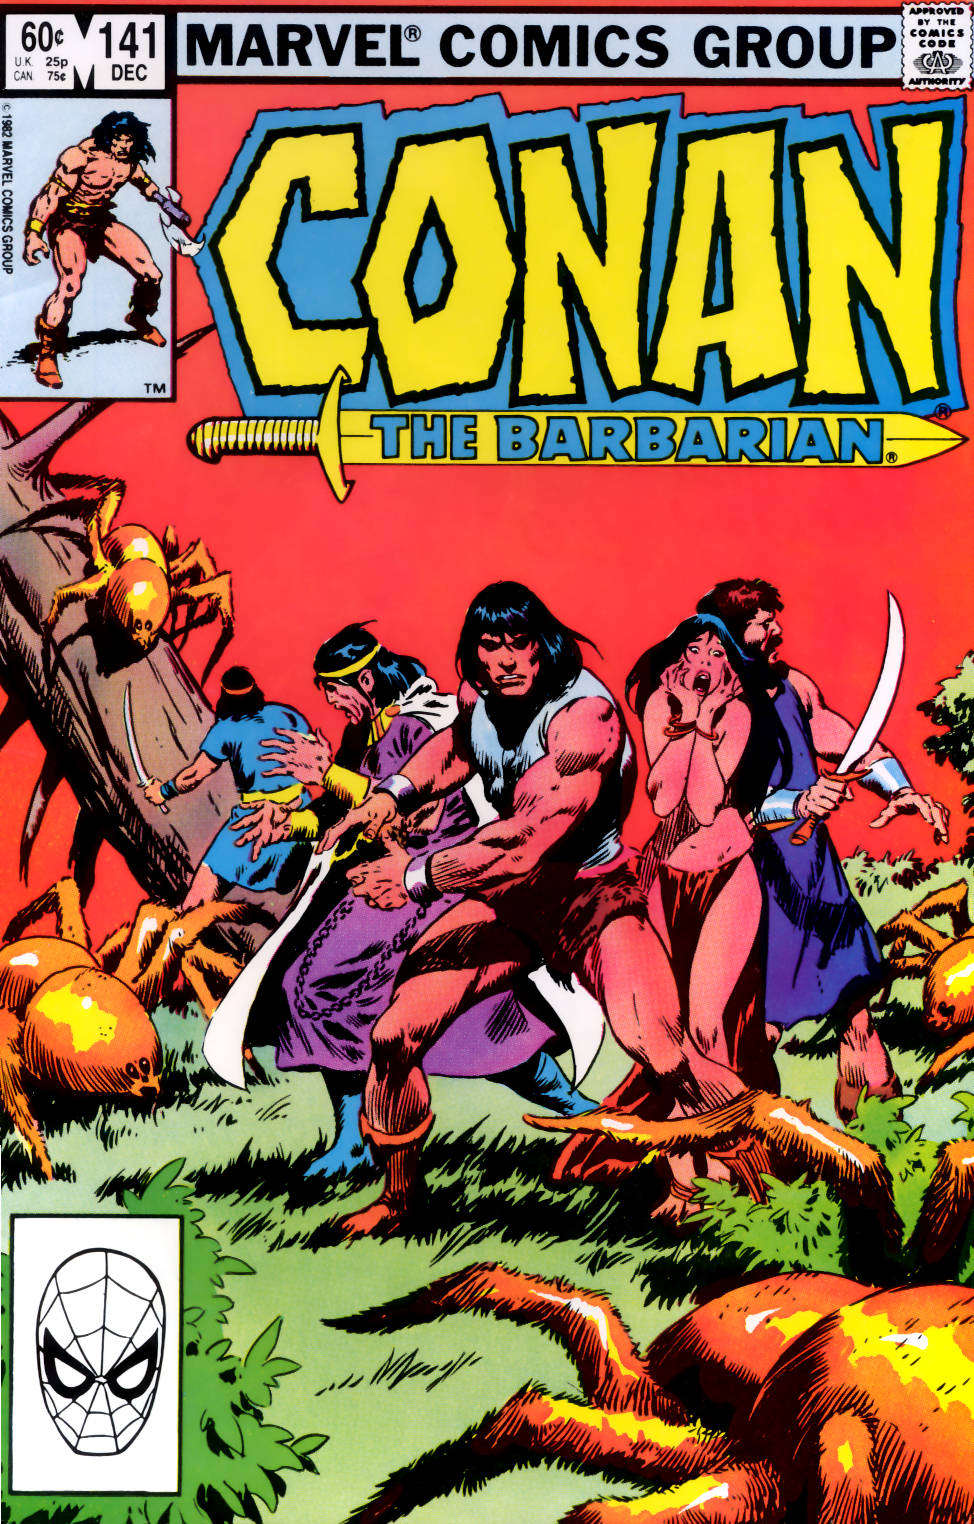 Conan the Barbarian (1970) Issue #141 #153 - English 1